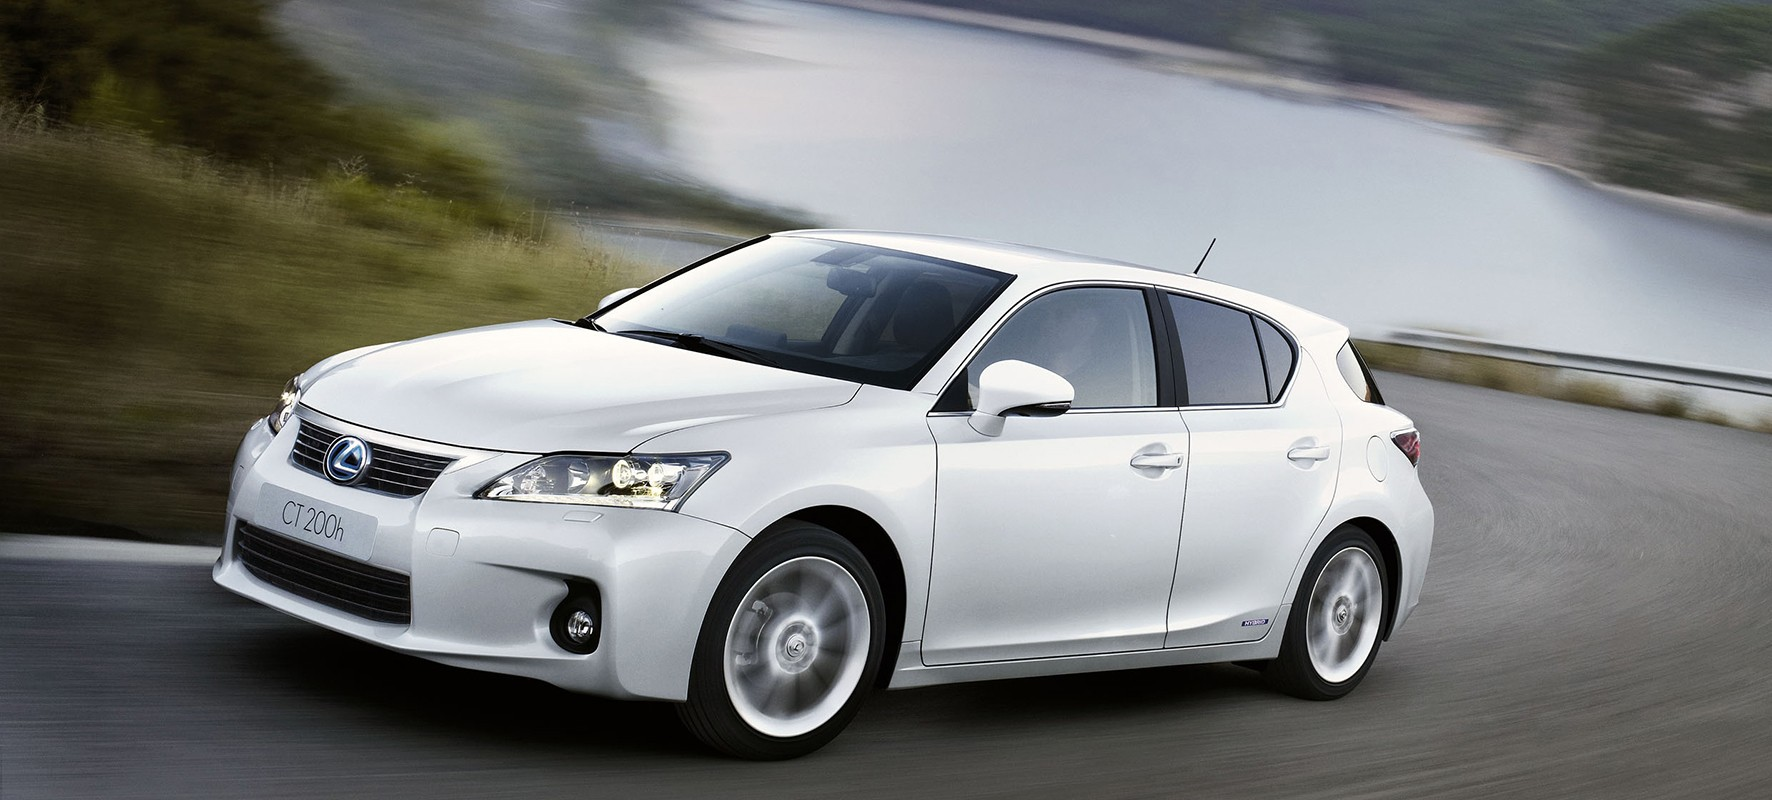 Lexus Premium Offer: CT 200h mét winterbanden